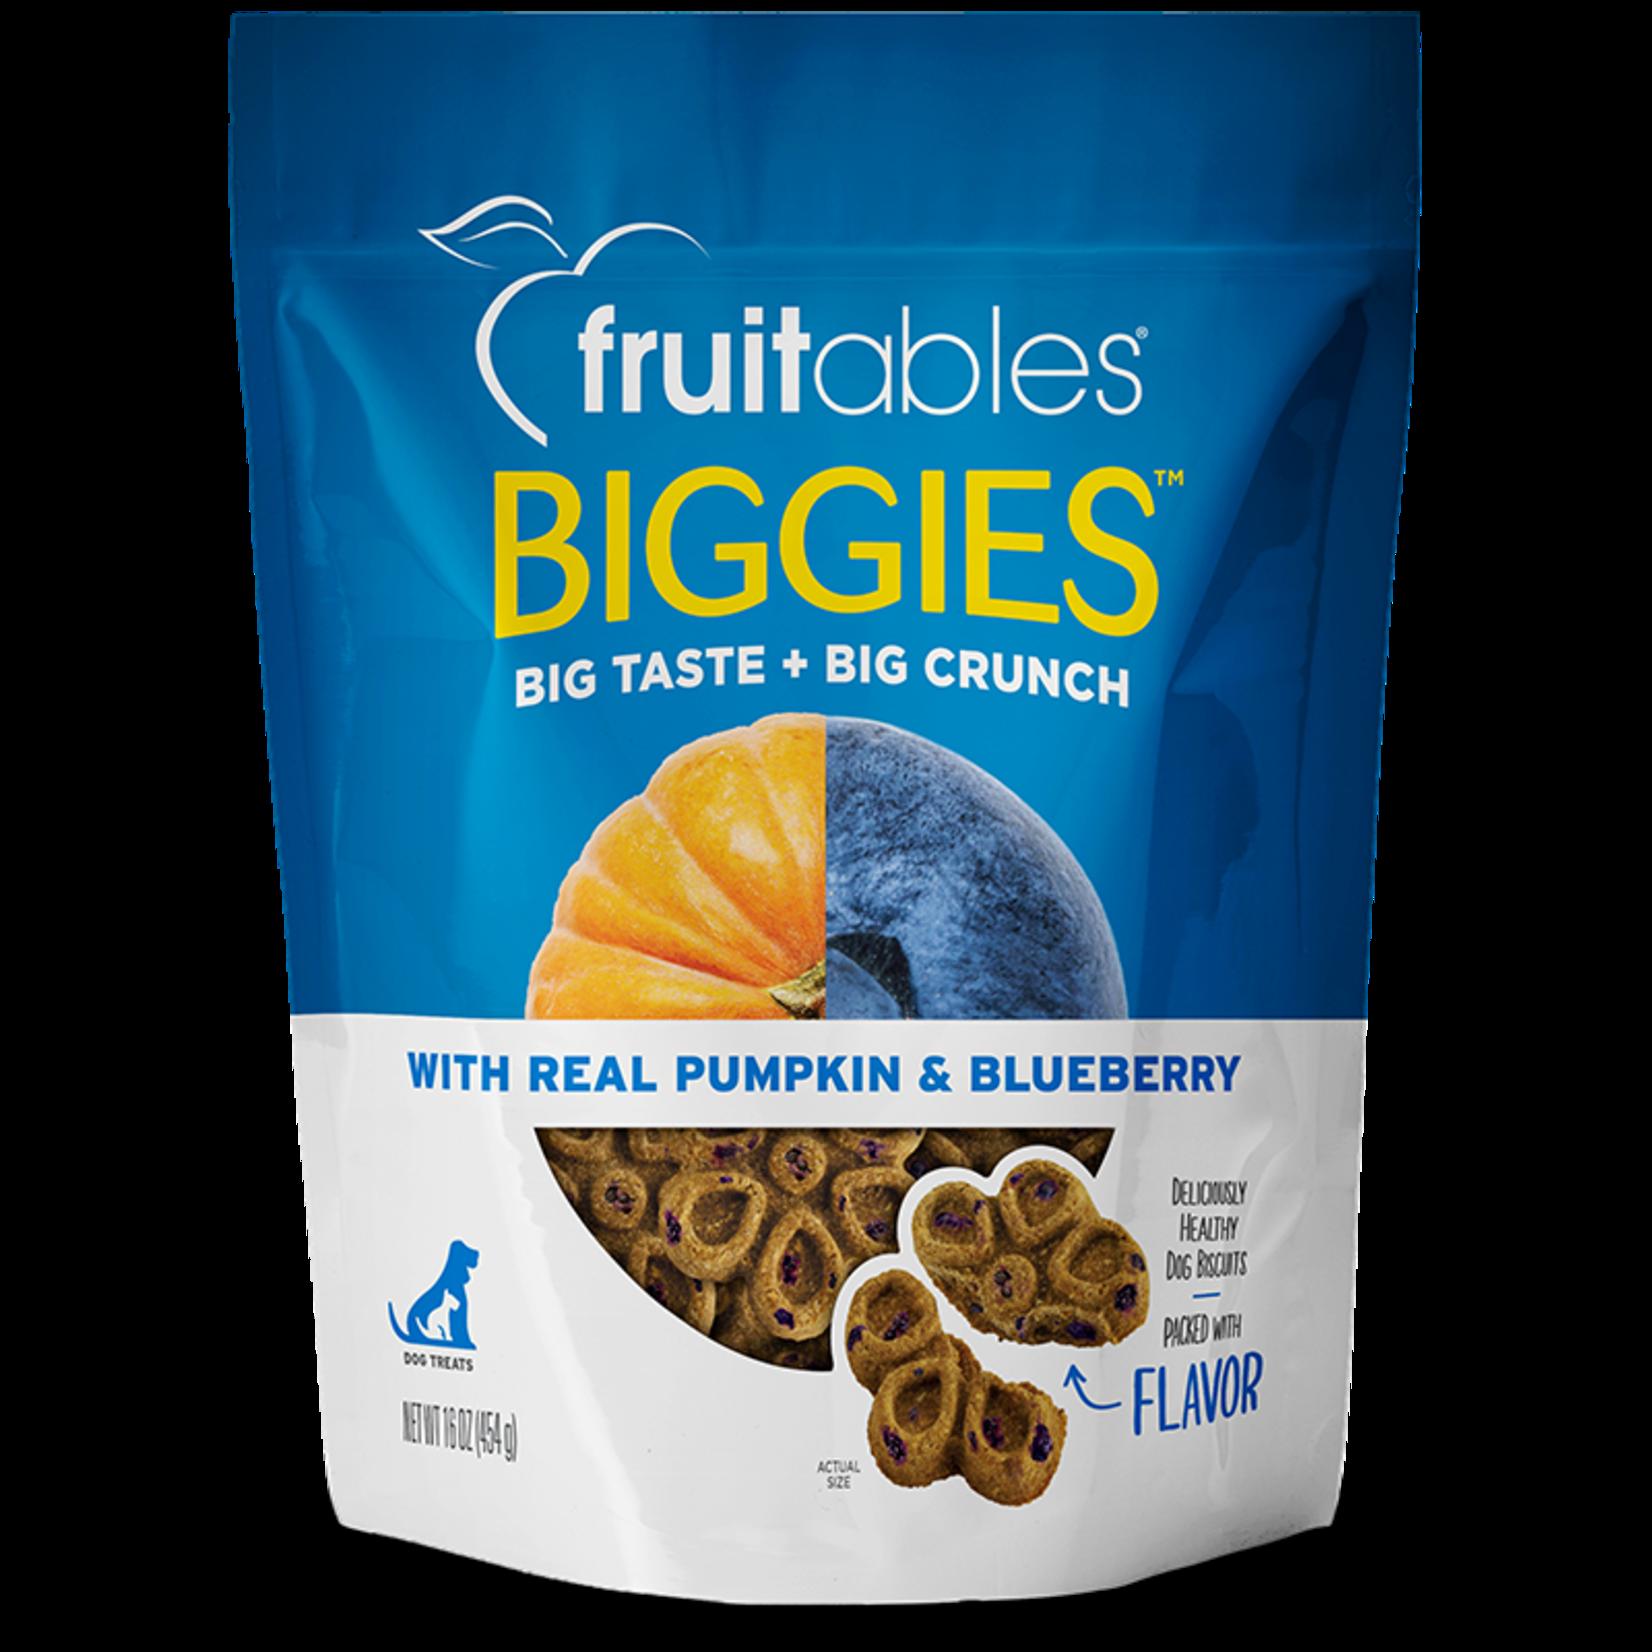 Fruitables Fruitables Biggies Pumpkin & Blueberry Dog Treat 16oz